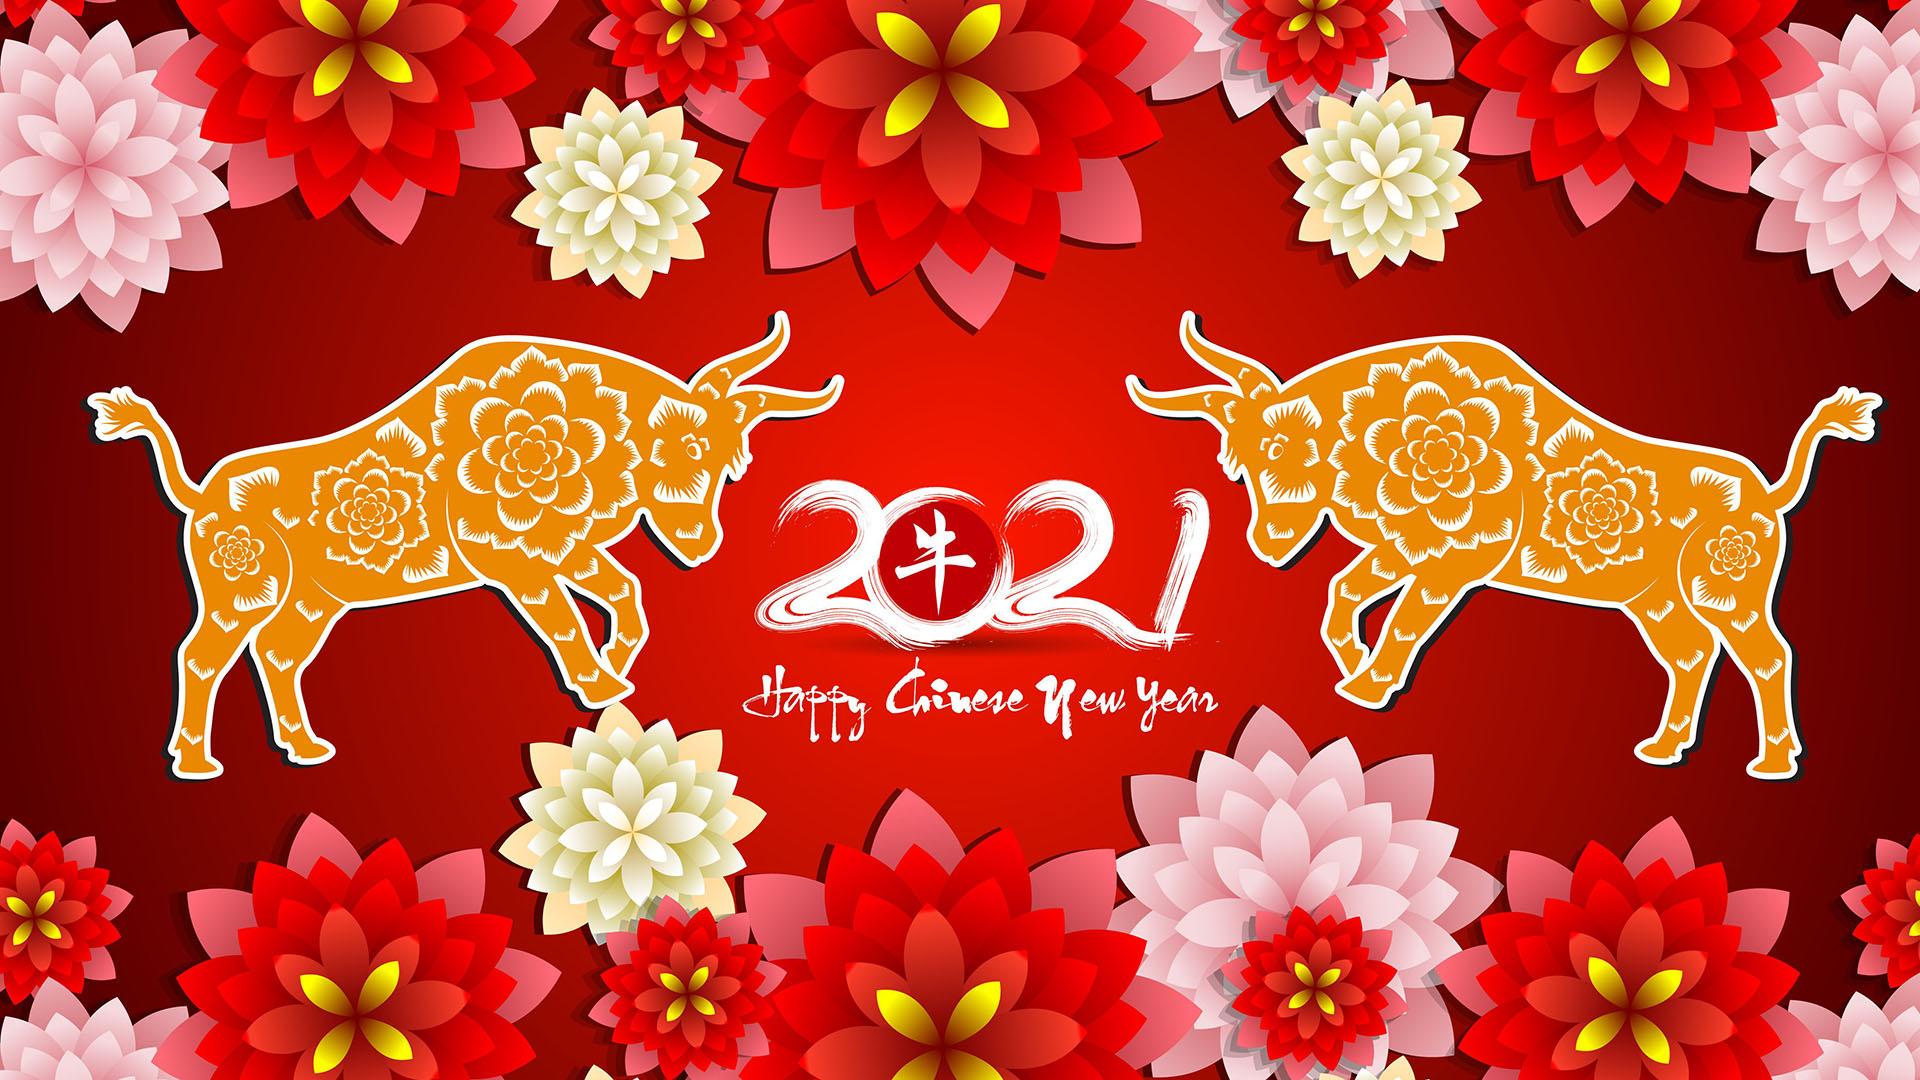 February 12 Chinese New Year Digital Signage Graphic